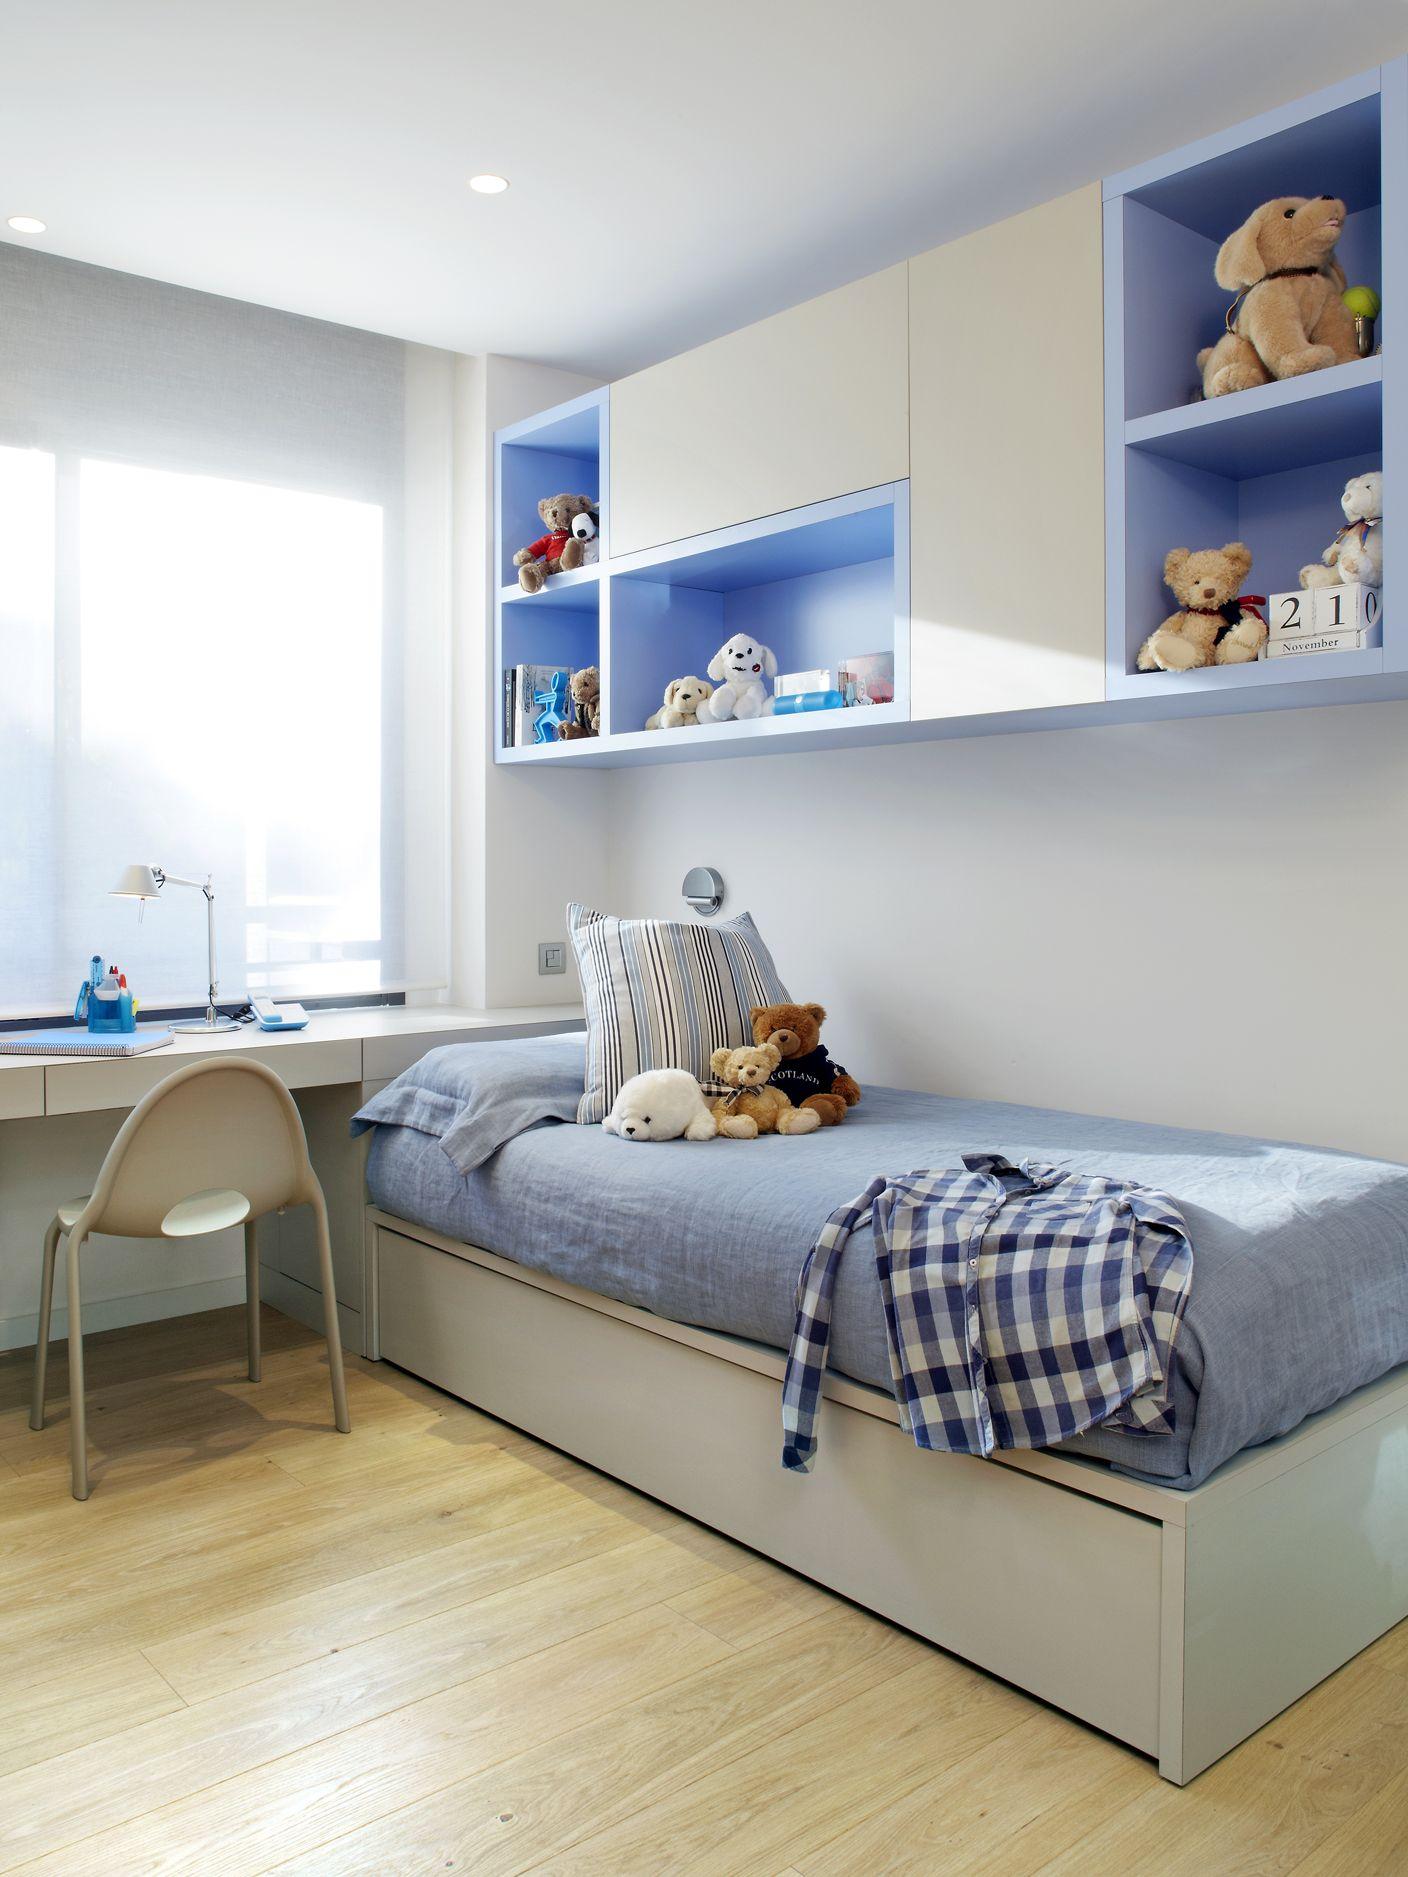 Molins interiors arquitectura interior interiorismo for Decoracion habitacion nino